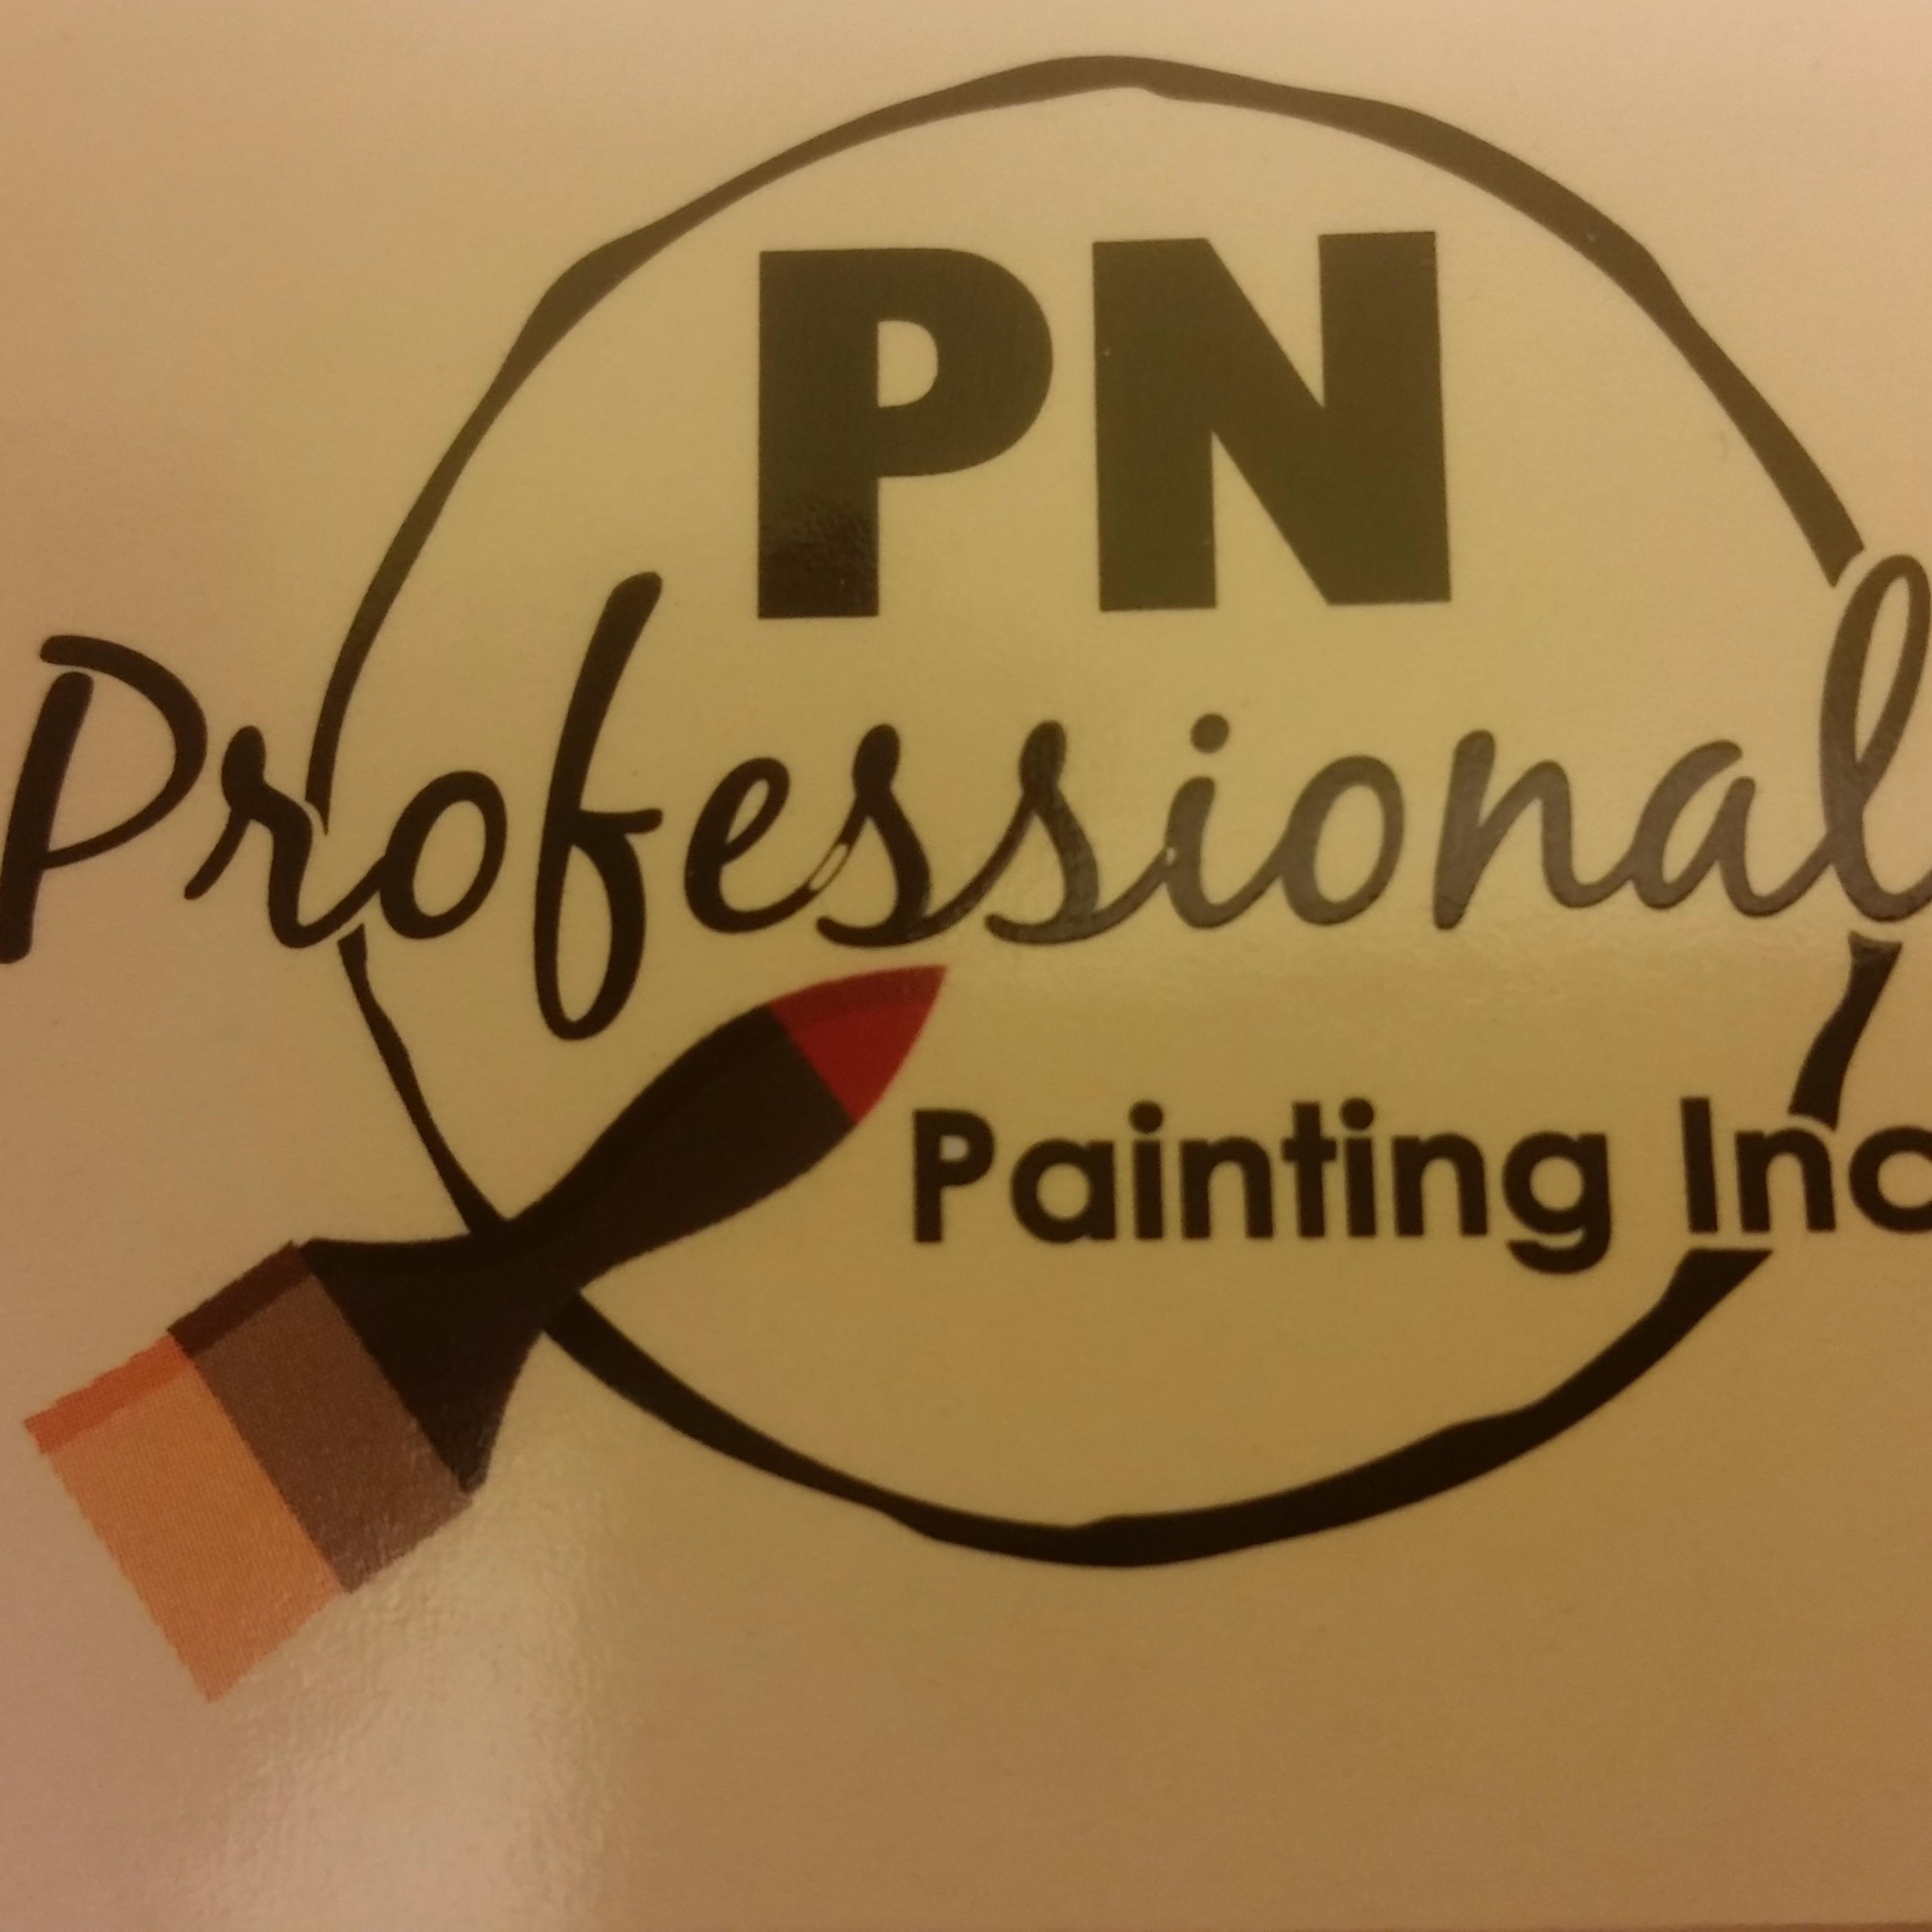 PN Professional Painting Inc.